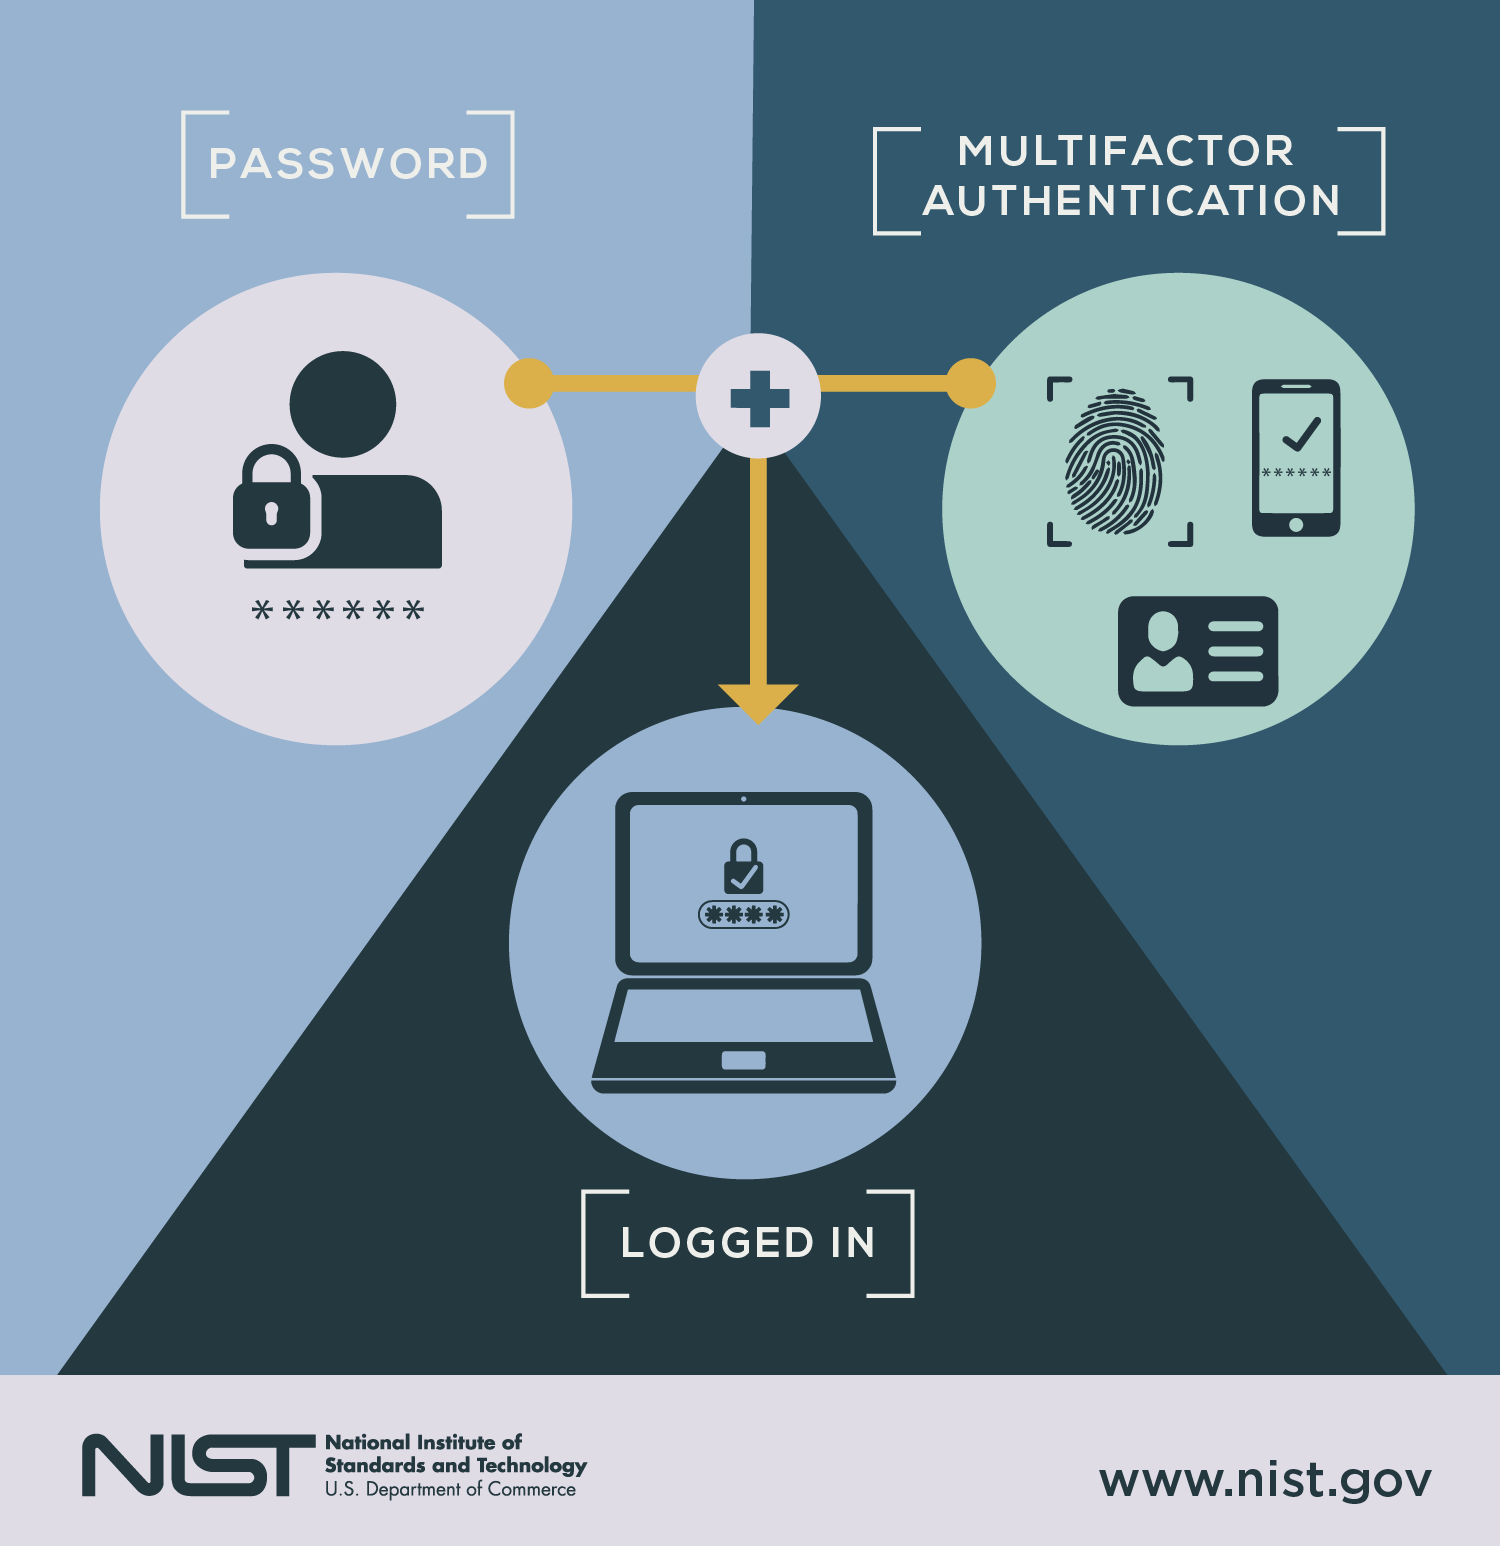 Back to basics: Multi-factor authentication (MFA) | NIST